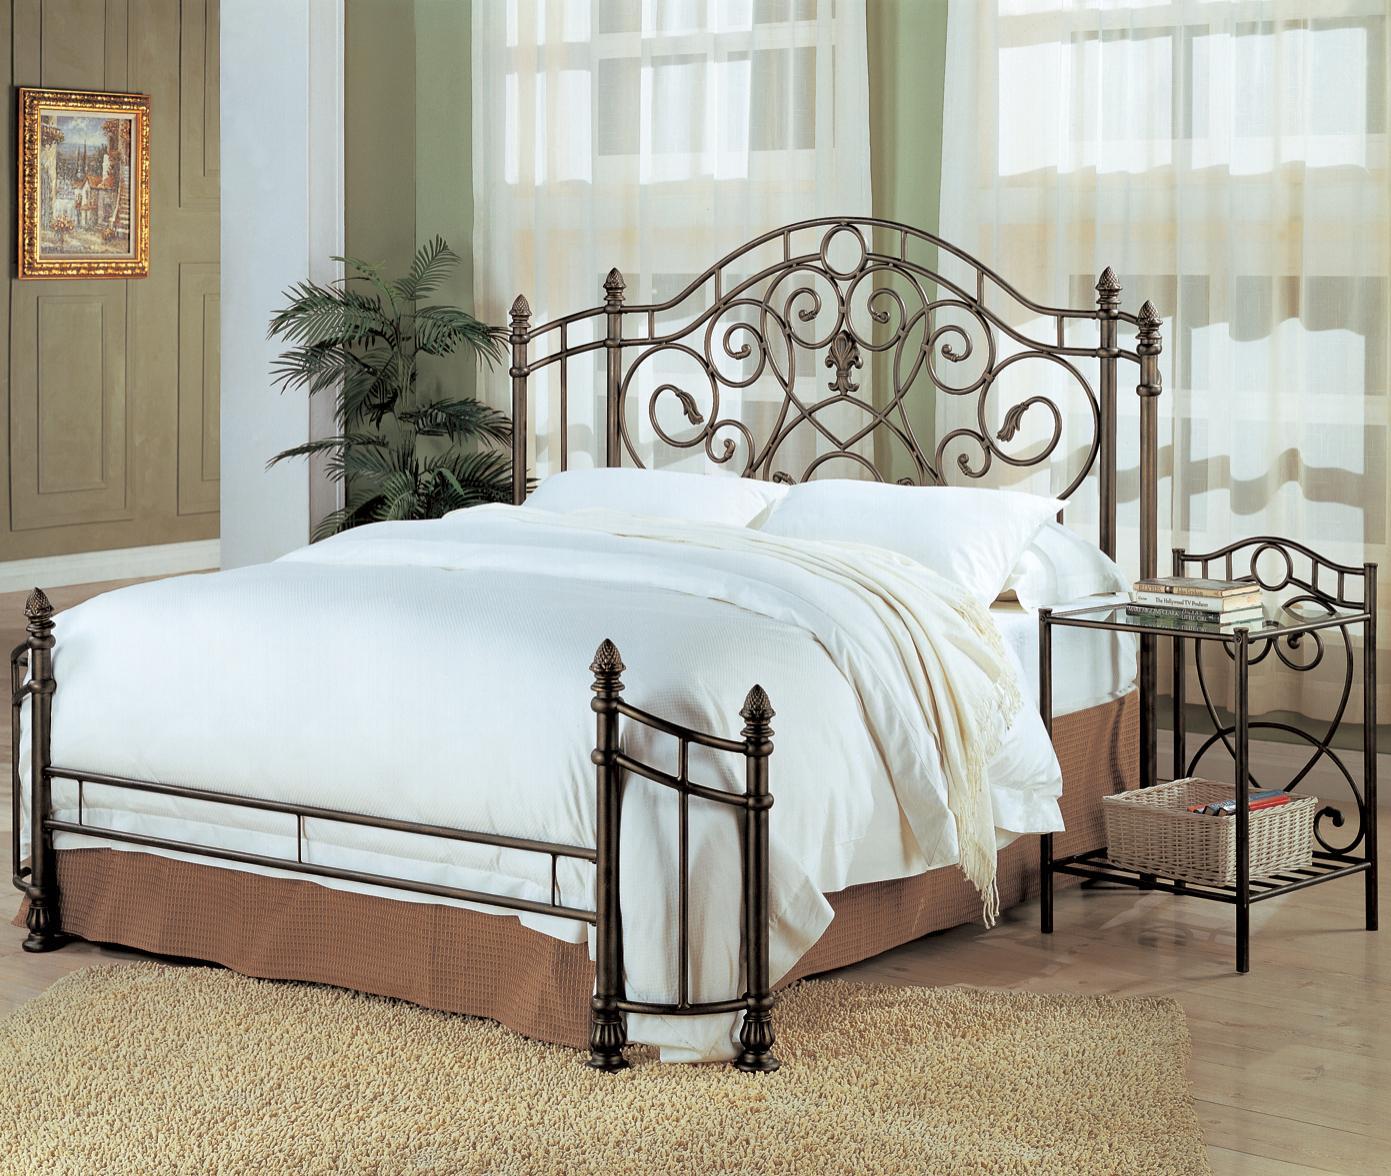 Sol Metal Bed